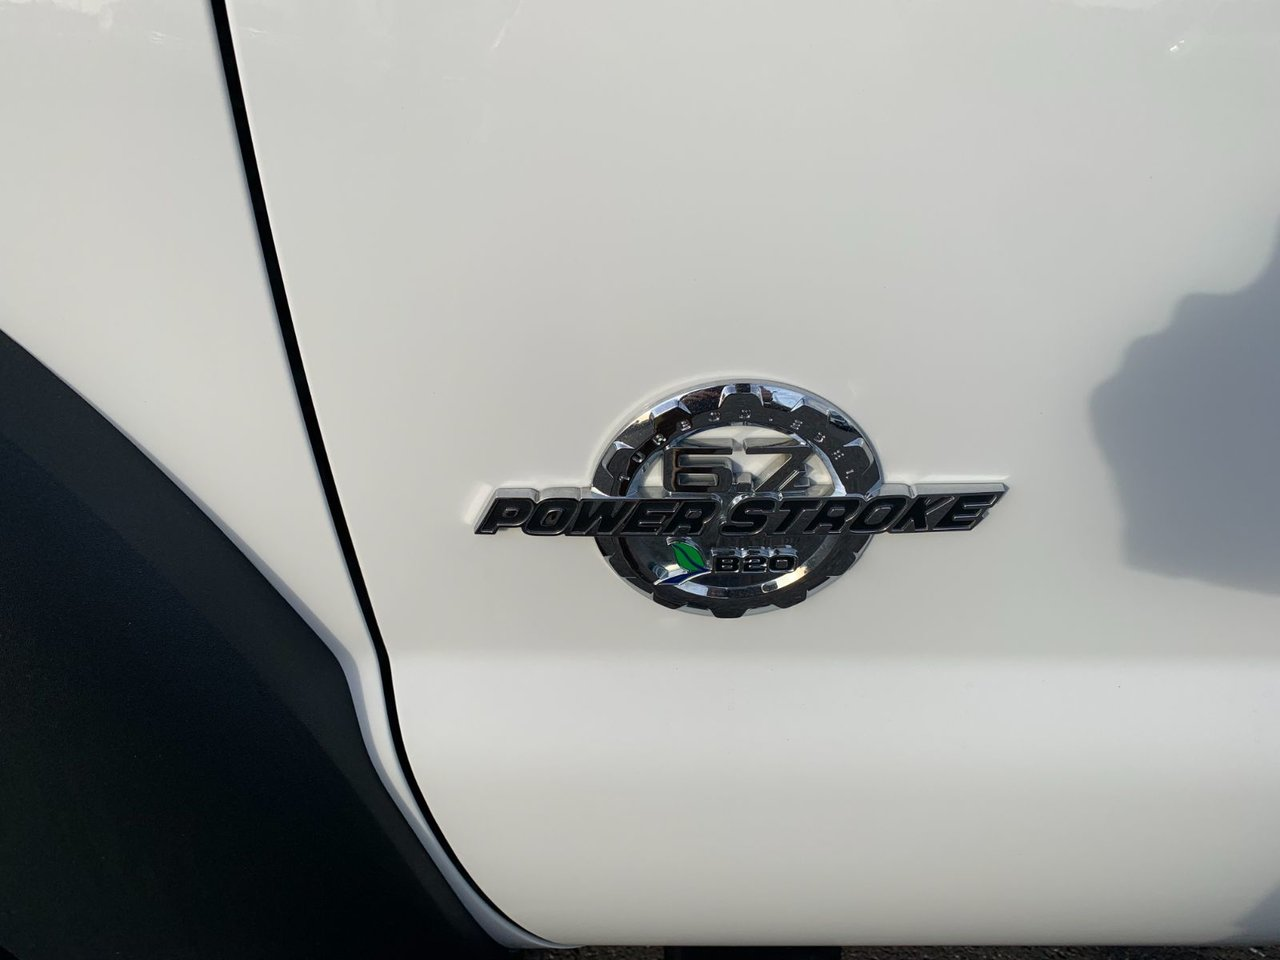 2013 Ford Super duty F-550 DRW XL CUBE 16 PIEDS